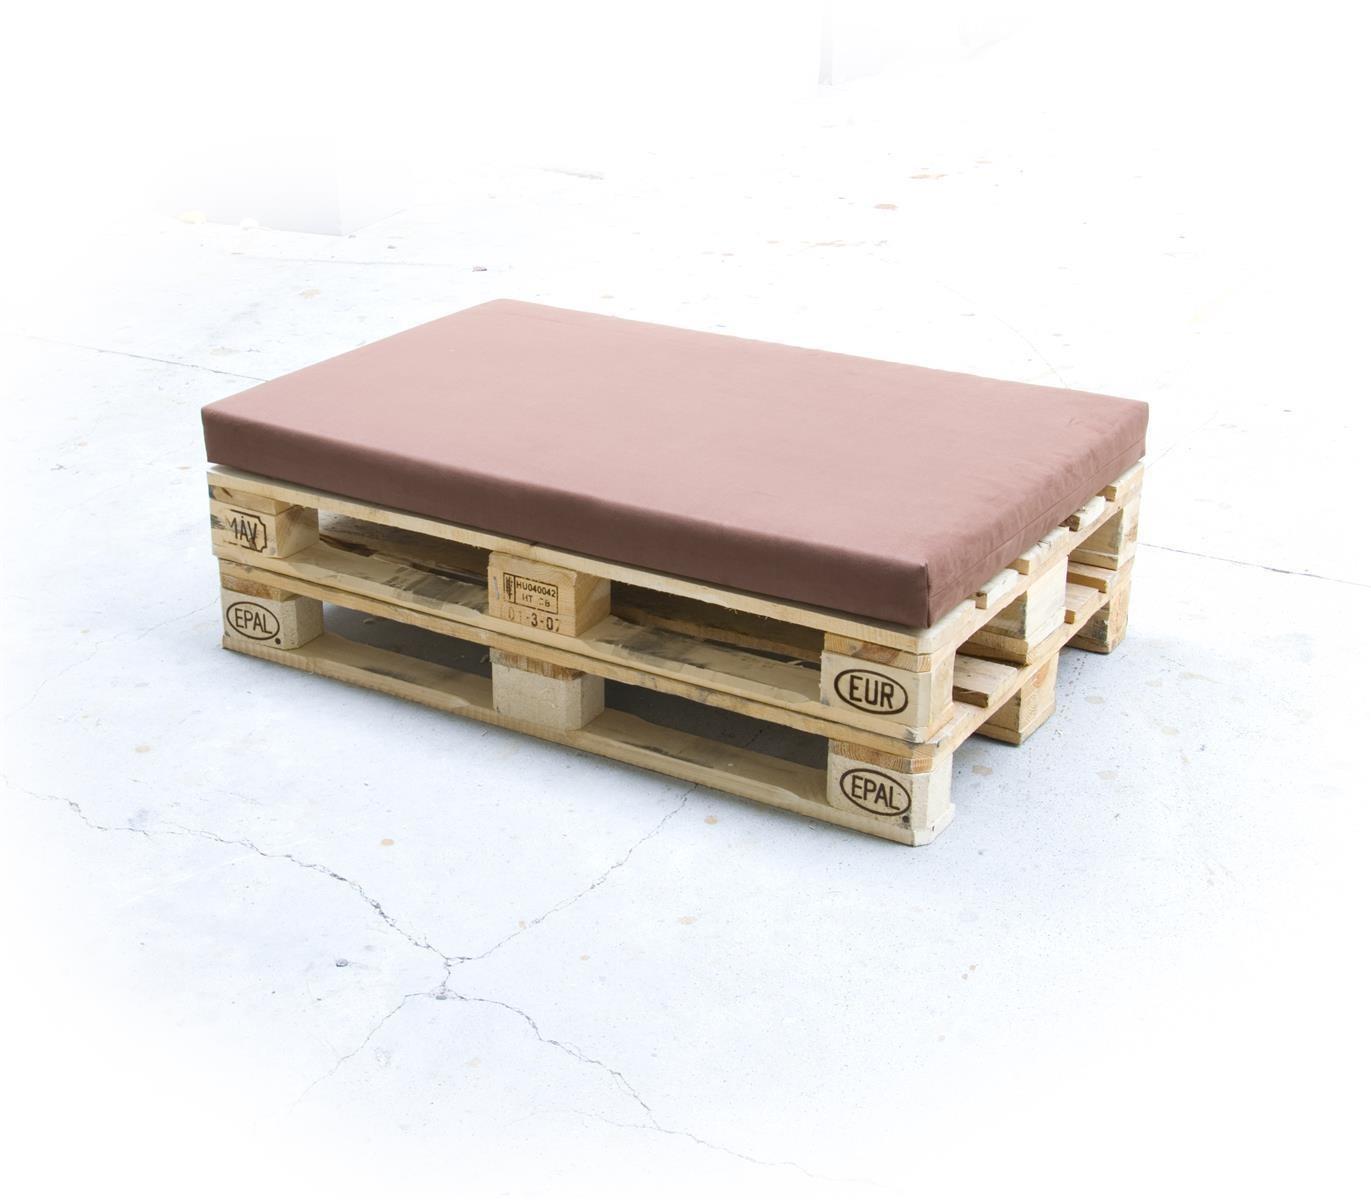 palettenpolster f r lounge sofam bel schaumstoff rg 35 sitzpolst 92 90. Black Bedroom Furniture Sets. Home Design Ideas